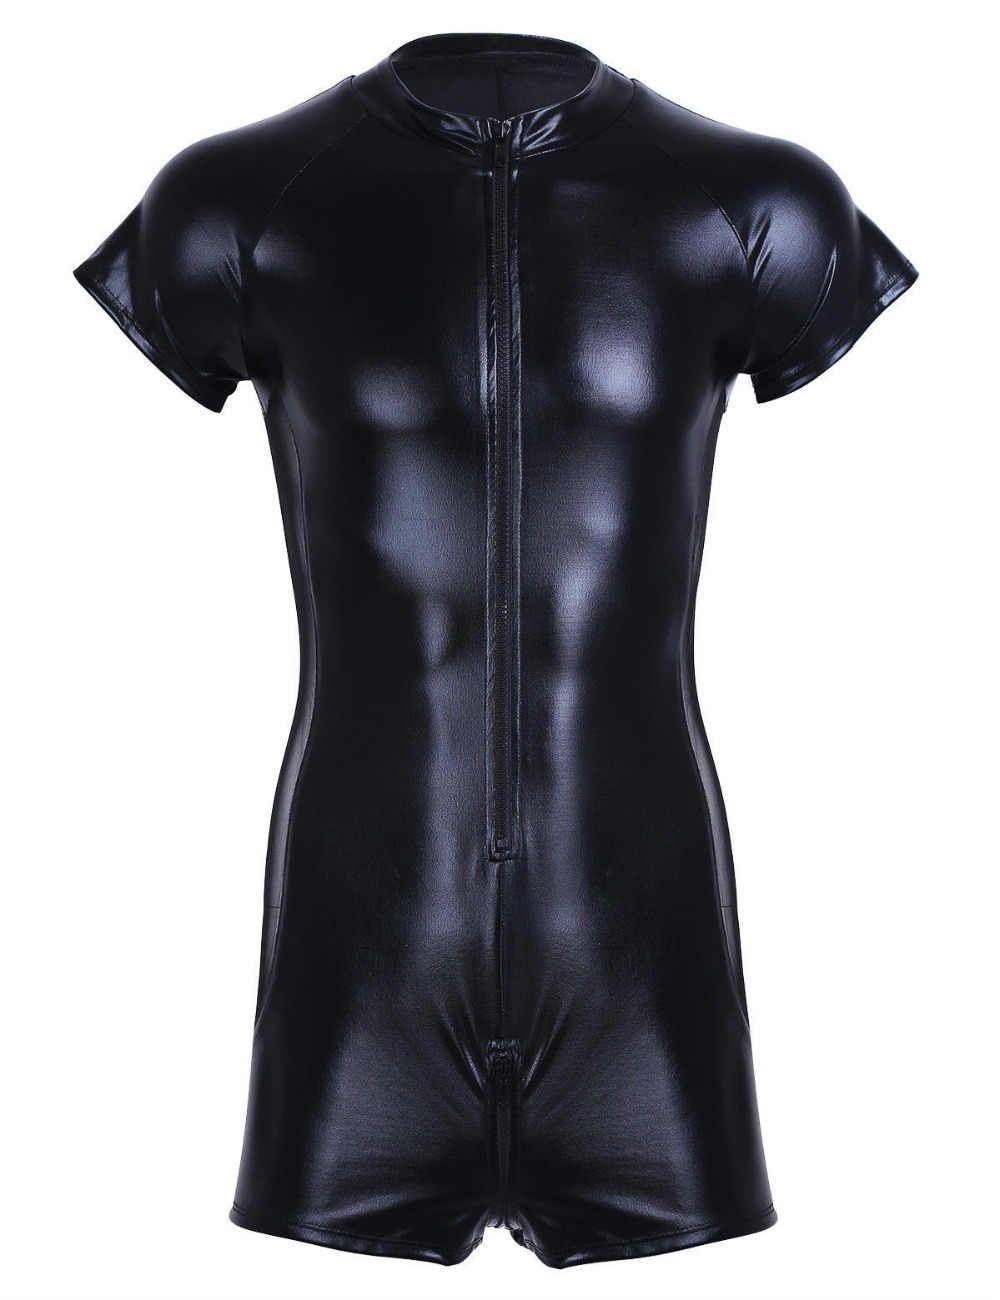 Men Faux Leather Bodysuit Leotard Wet Look Stretch Swimsuit Bikini Tank Top Club